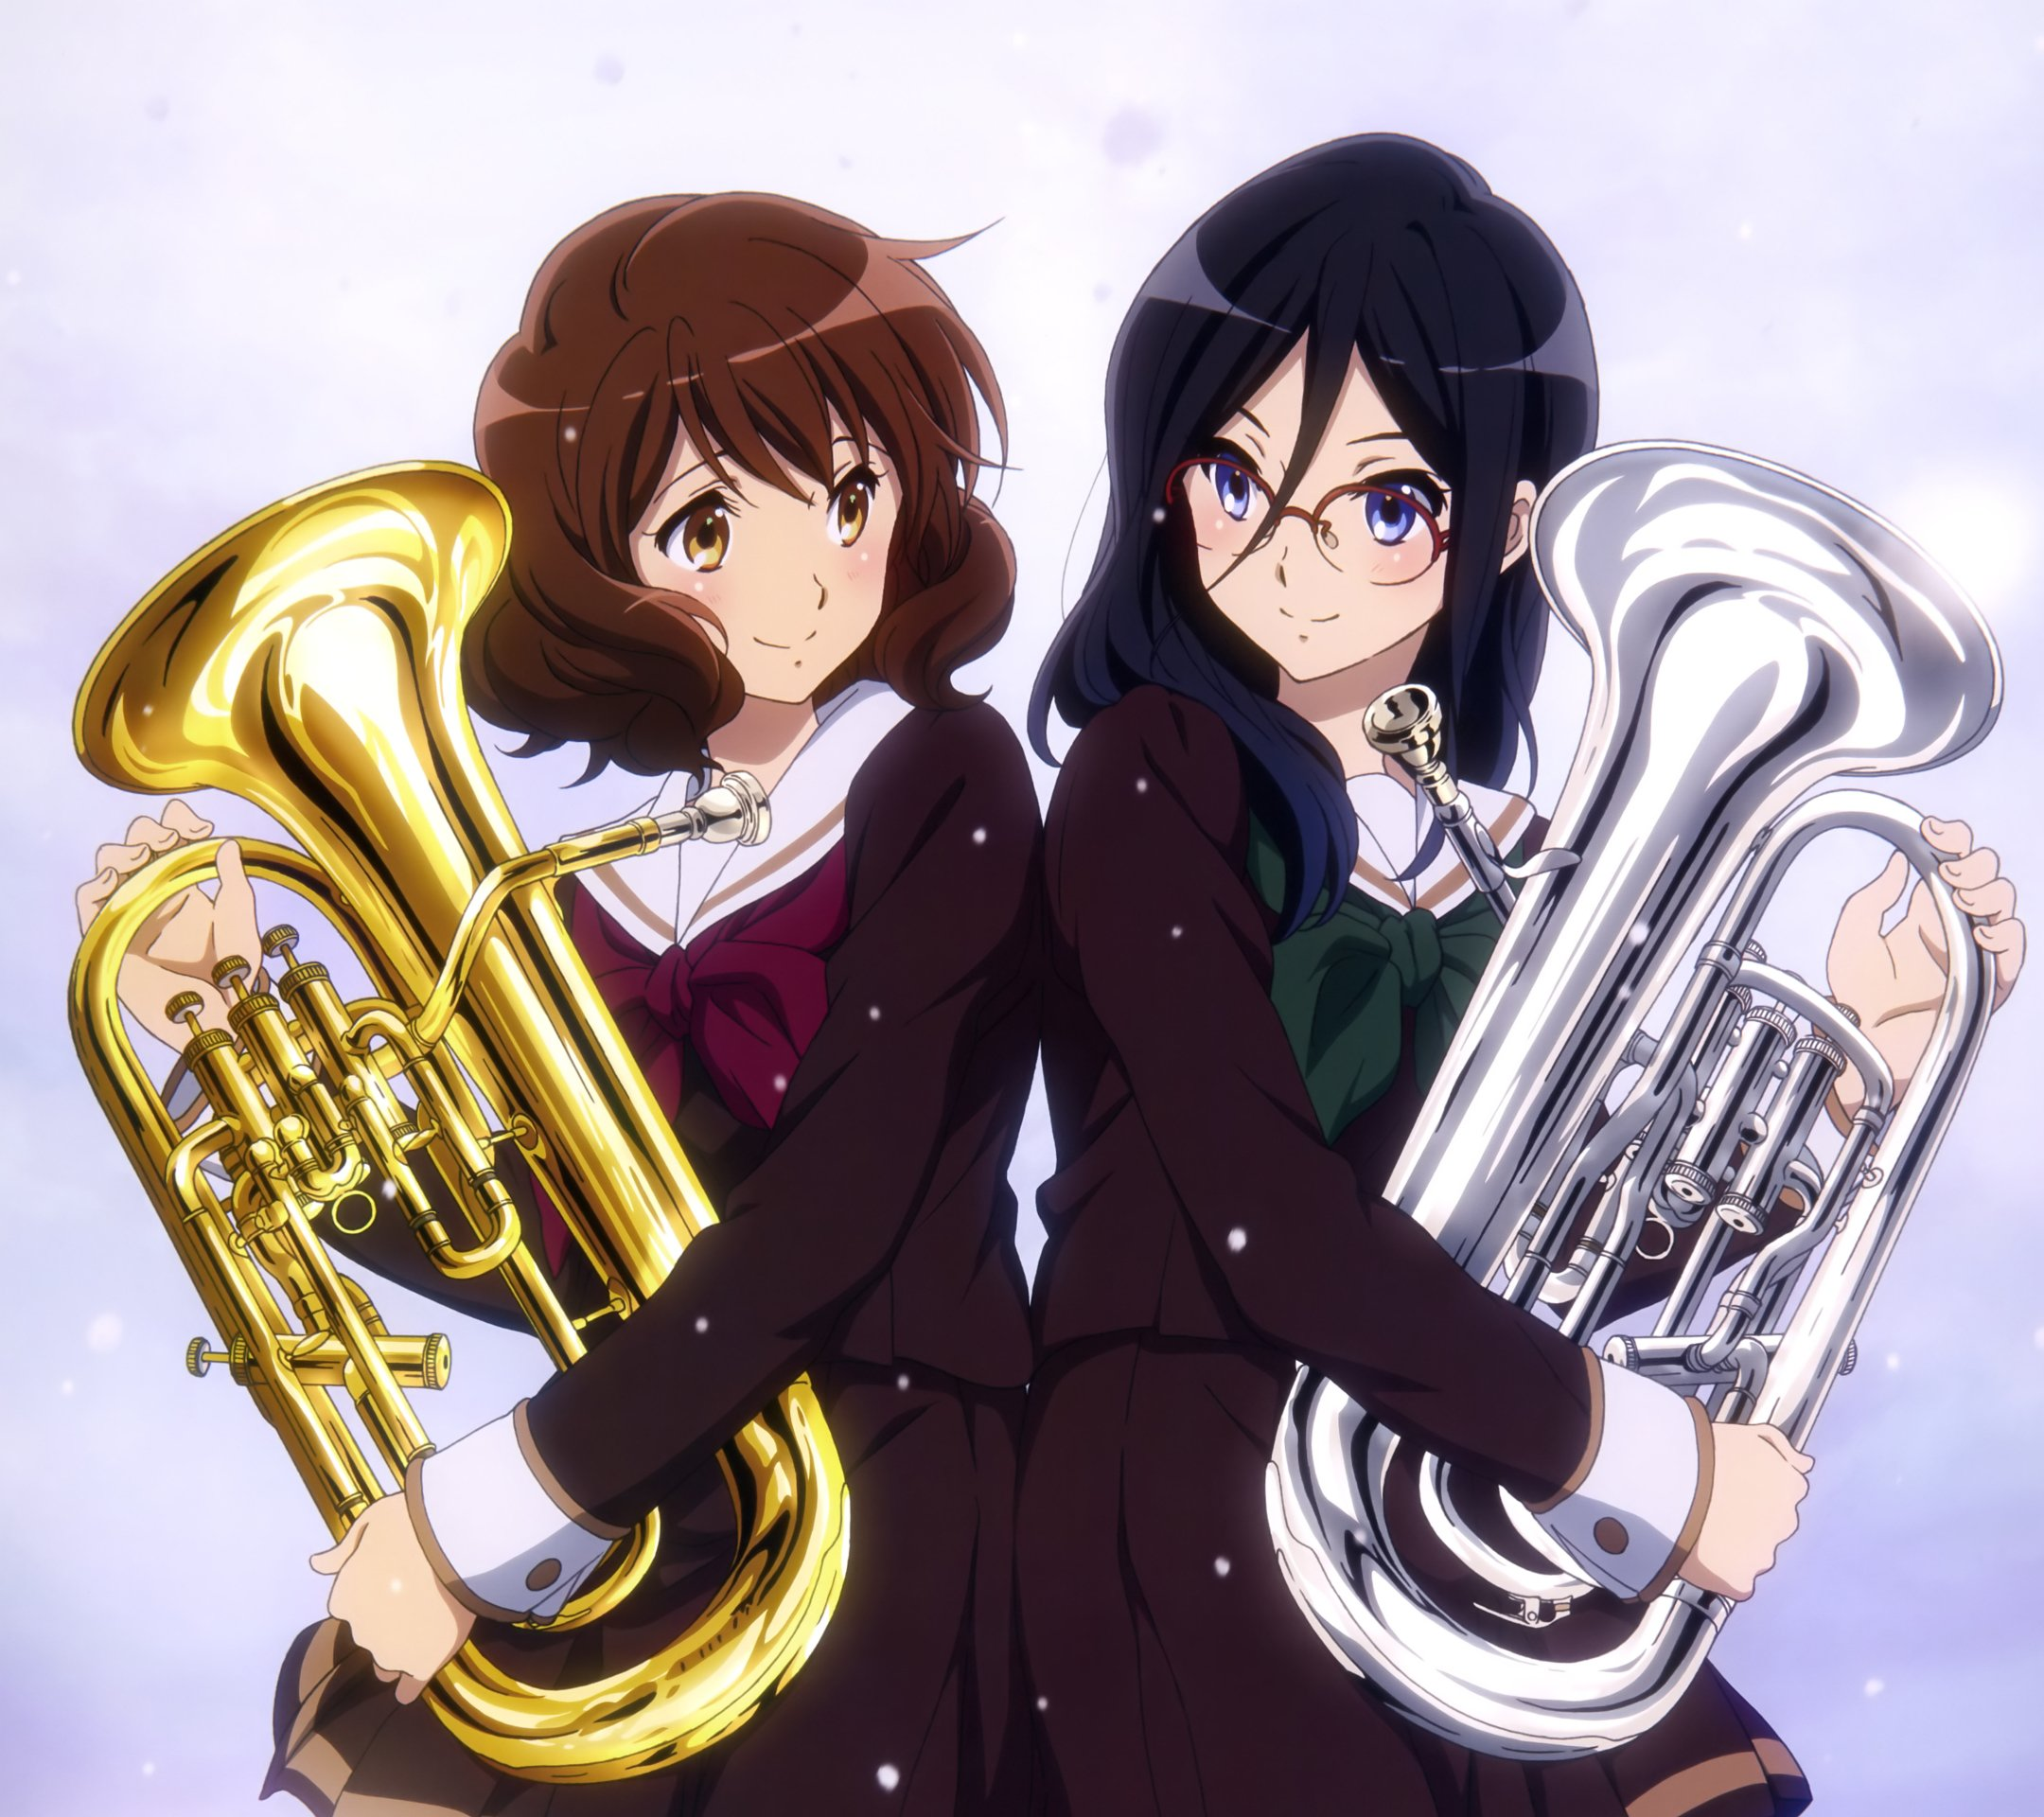 Sound Euphonium anime iPhone wallpapers 2160x1920